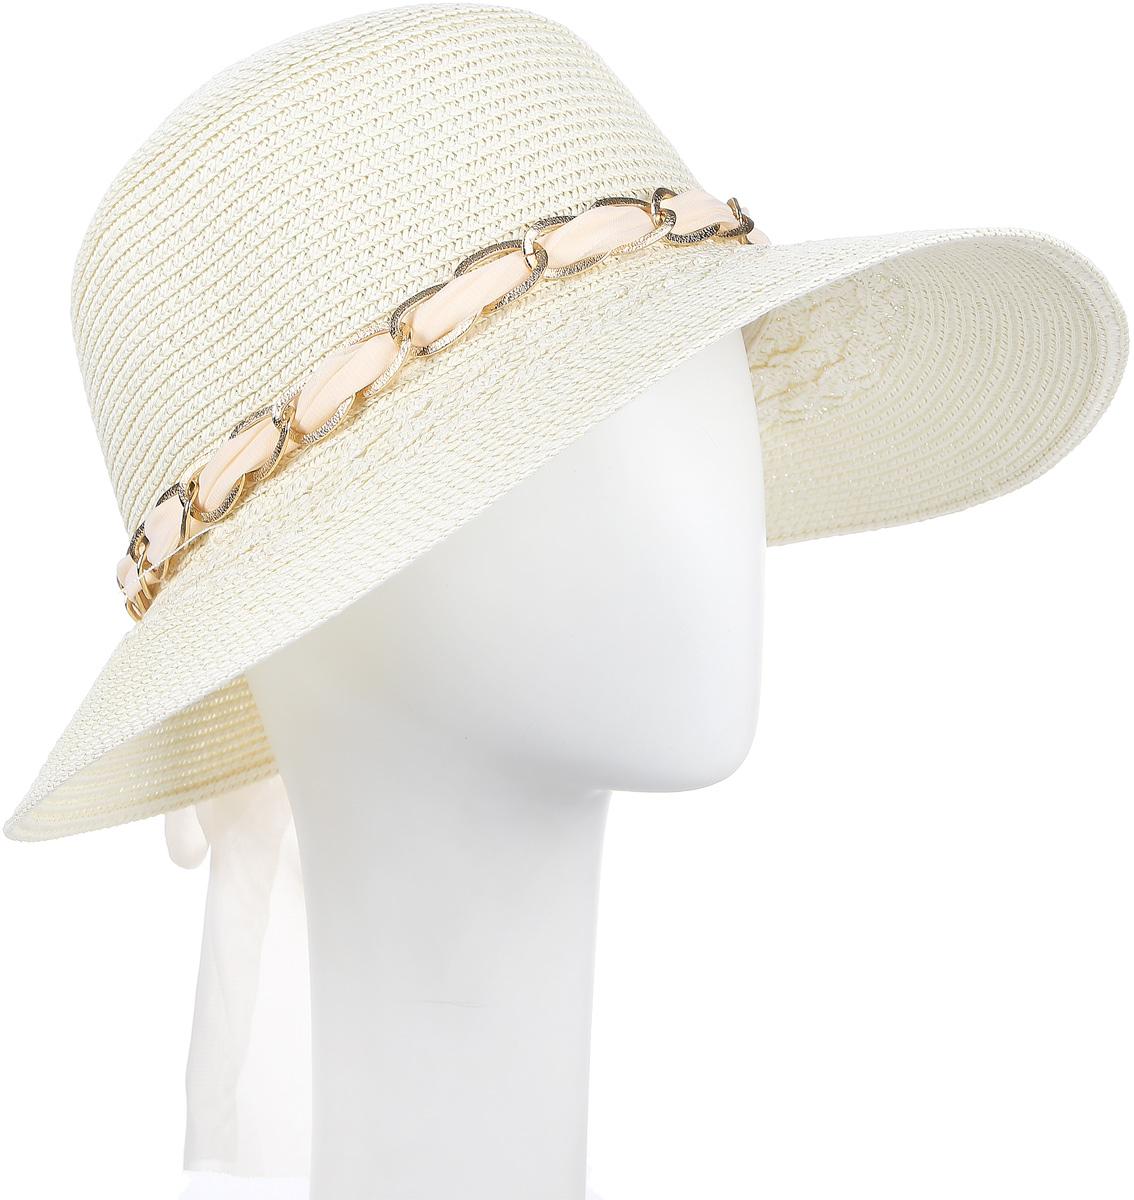 ШляпаHtW100275Нежная женская шляпа, украшенная бантом.